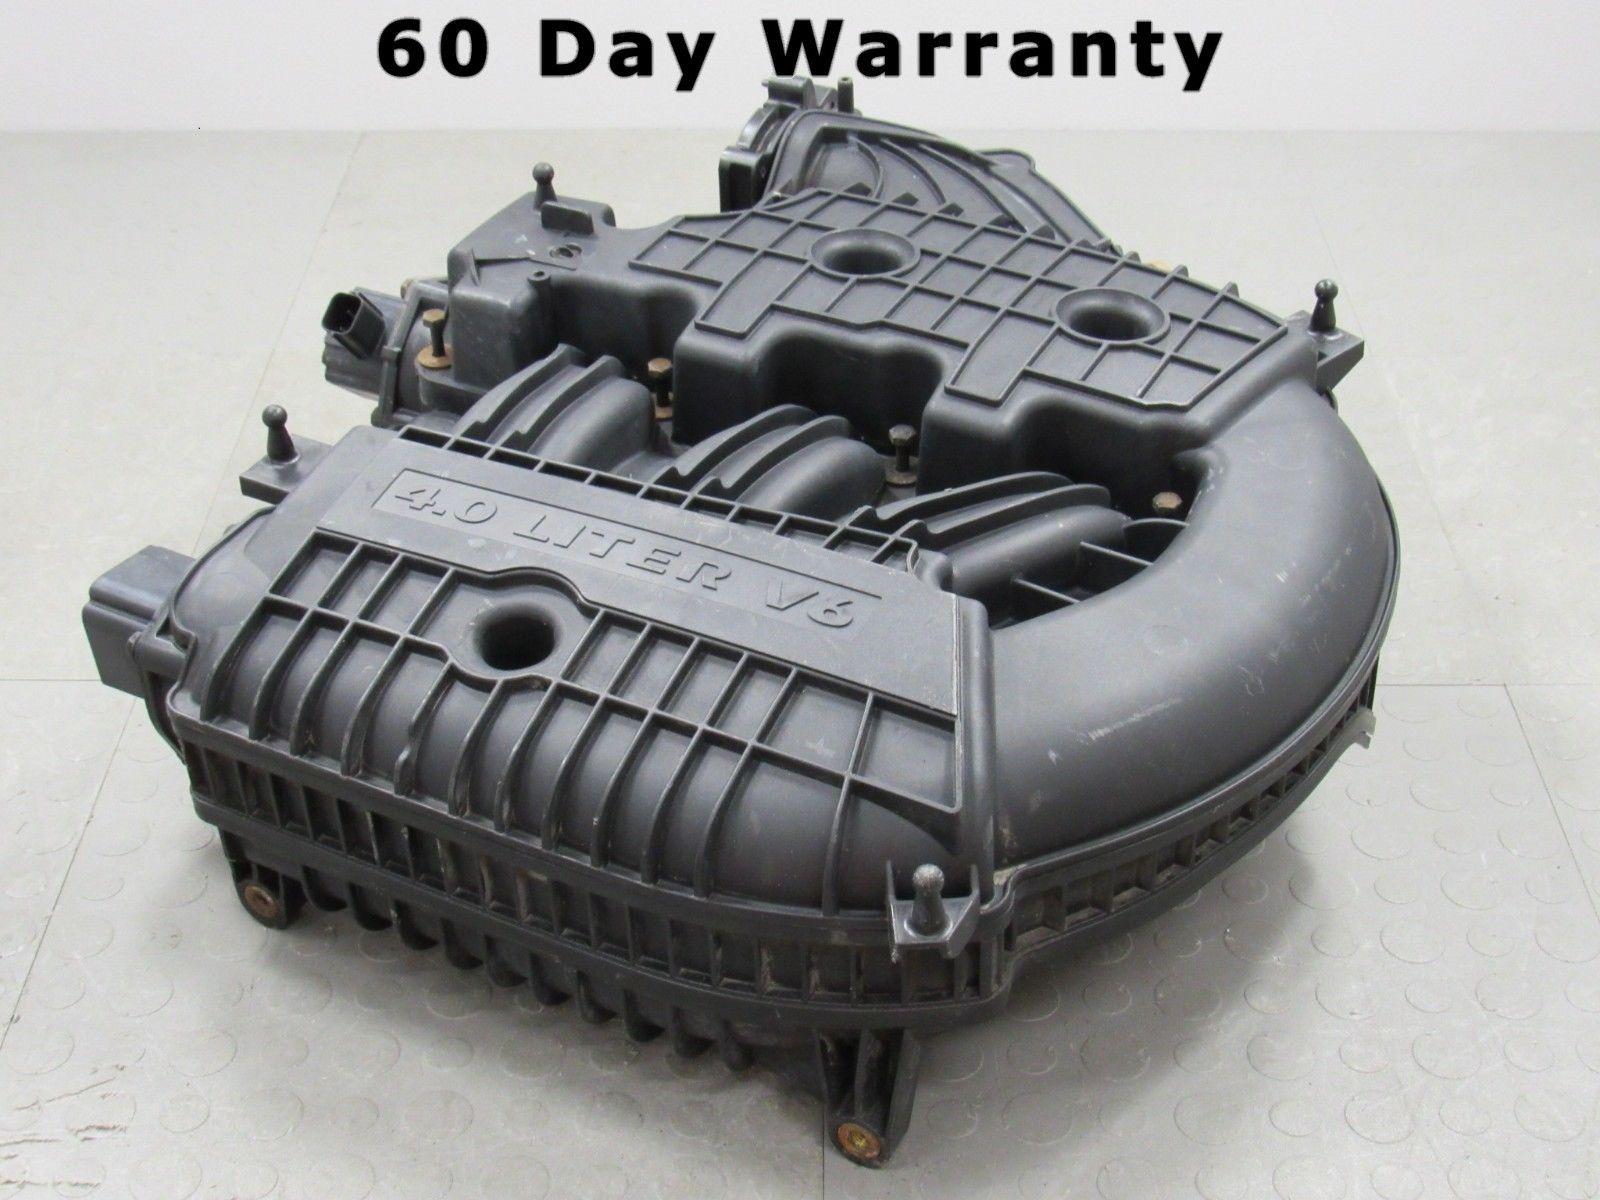 07 Chrysler Pacifica Dodge Nitro 4 0l Upper Intake Manifold Air Inlet Plenum W